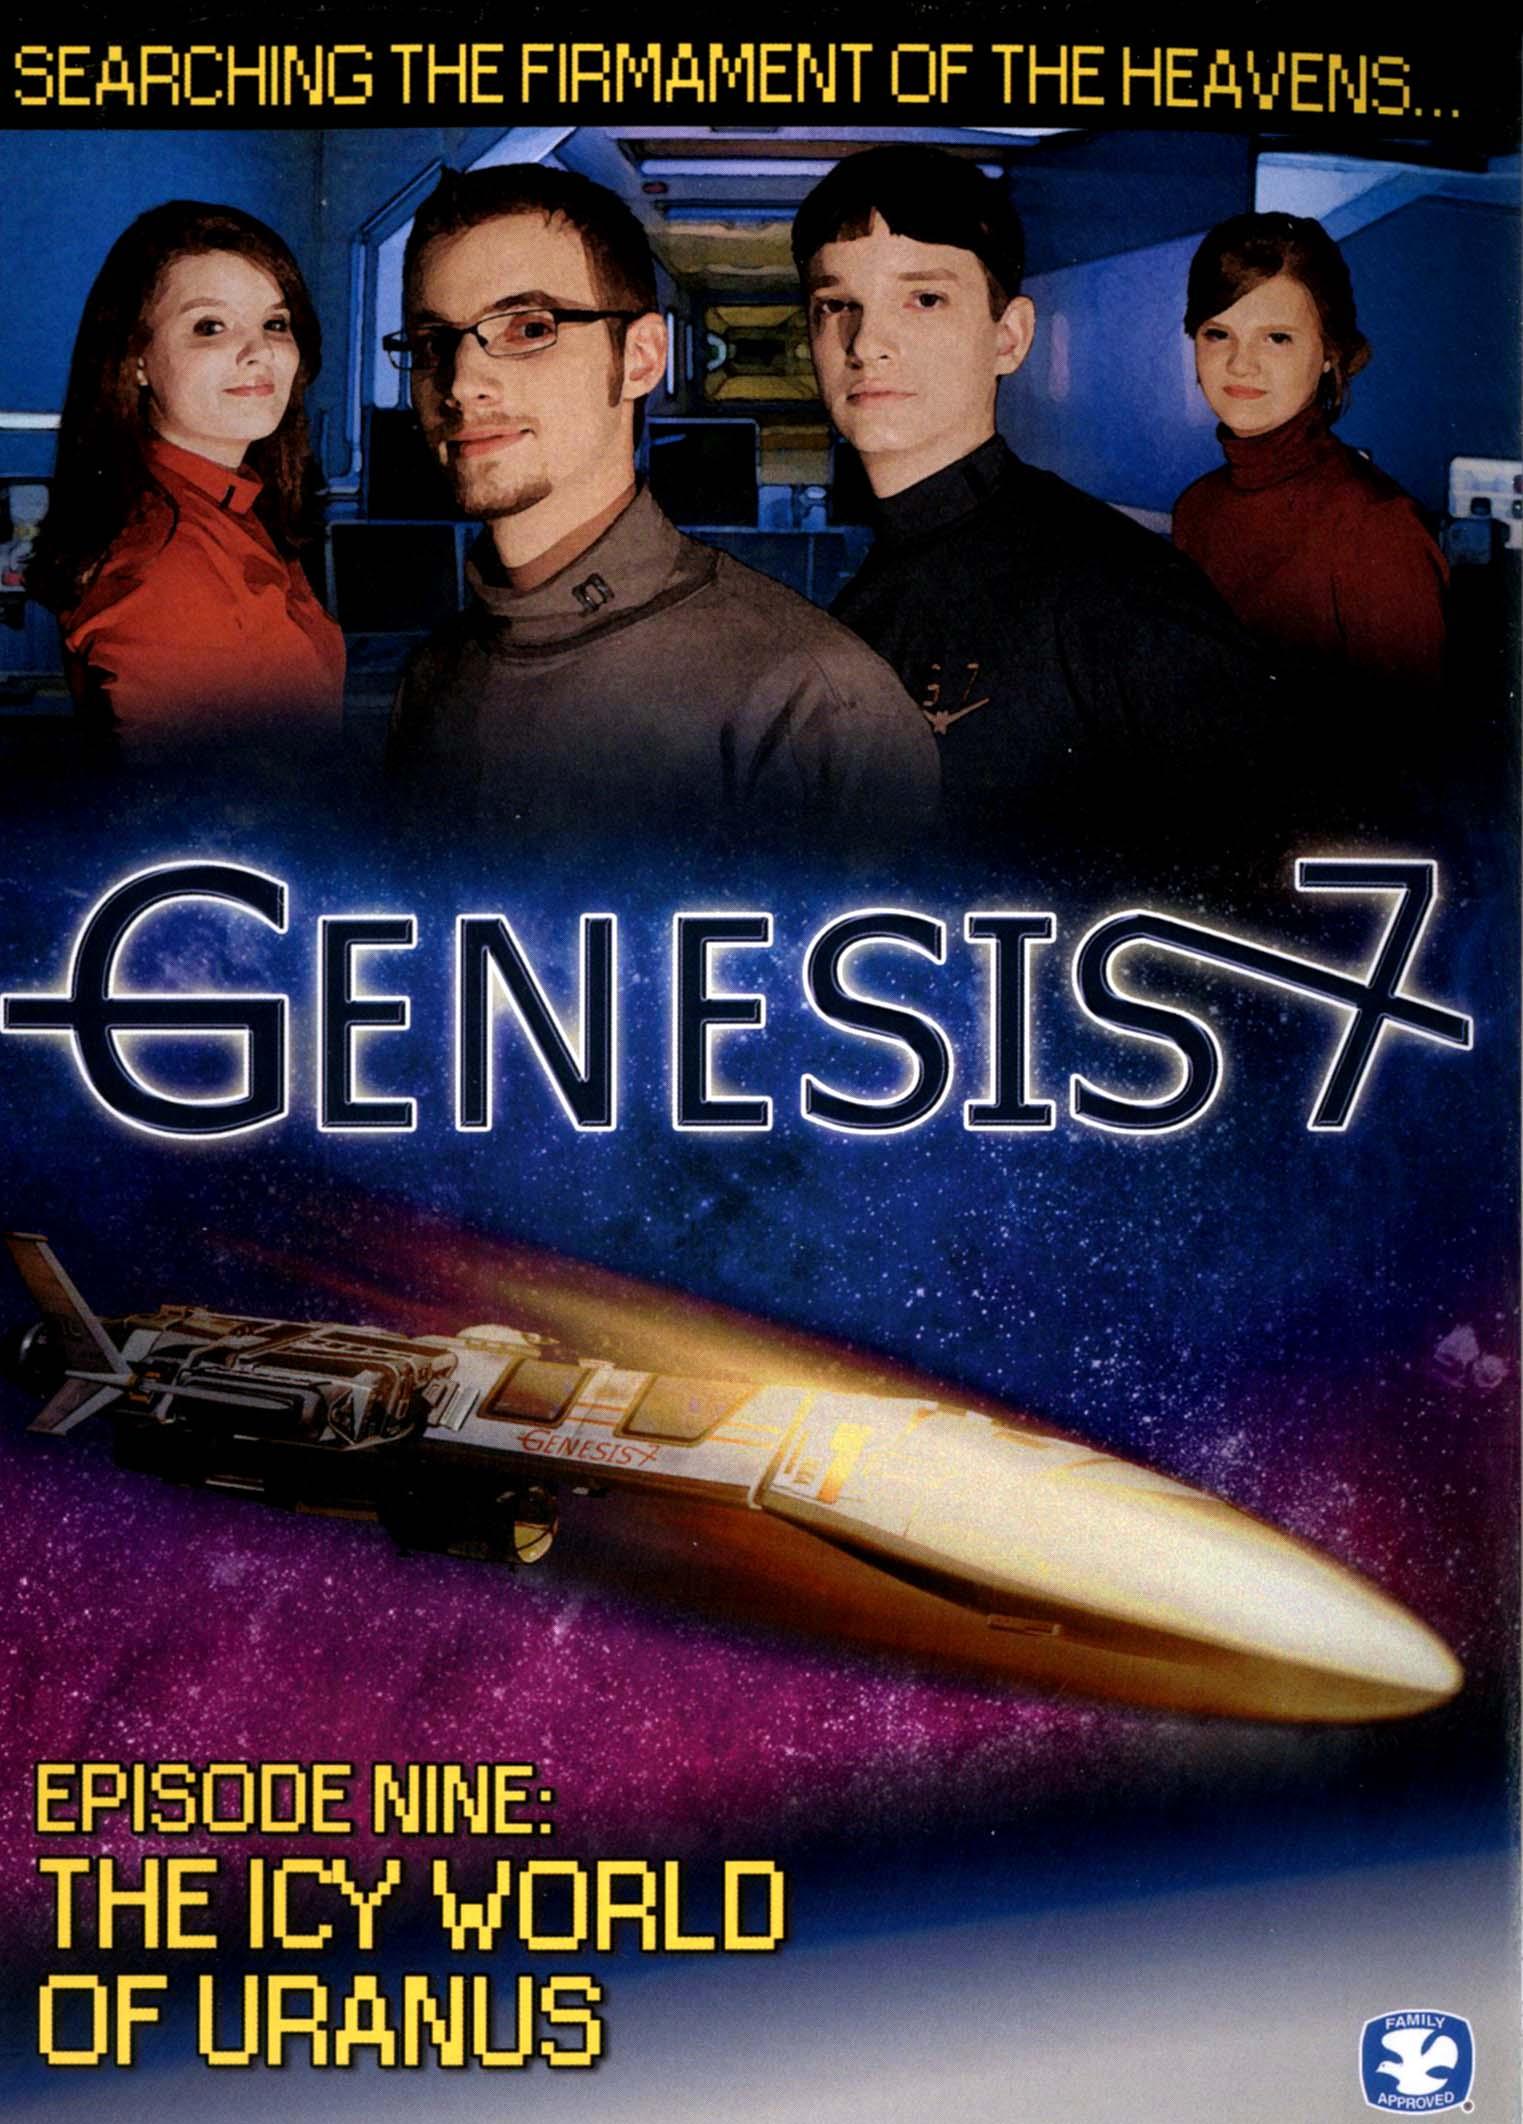 Genesis 7: Episode Nine - The Icy World of Uranus